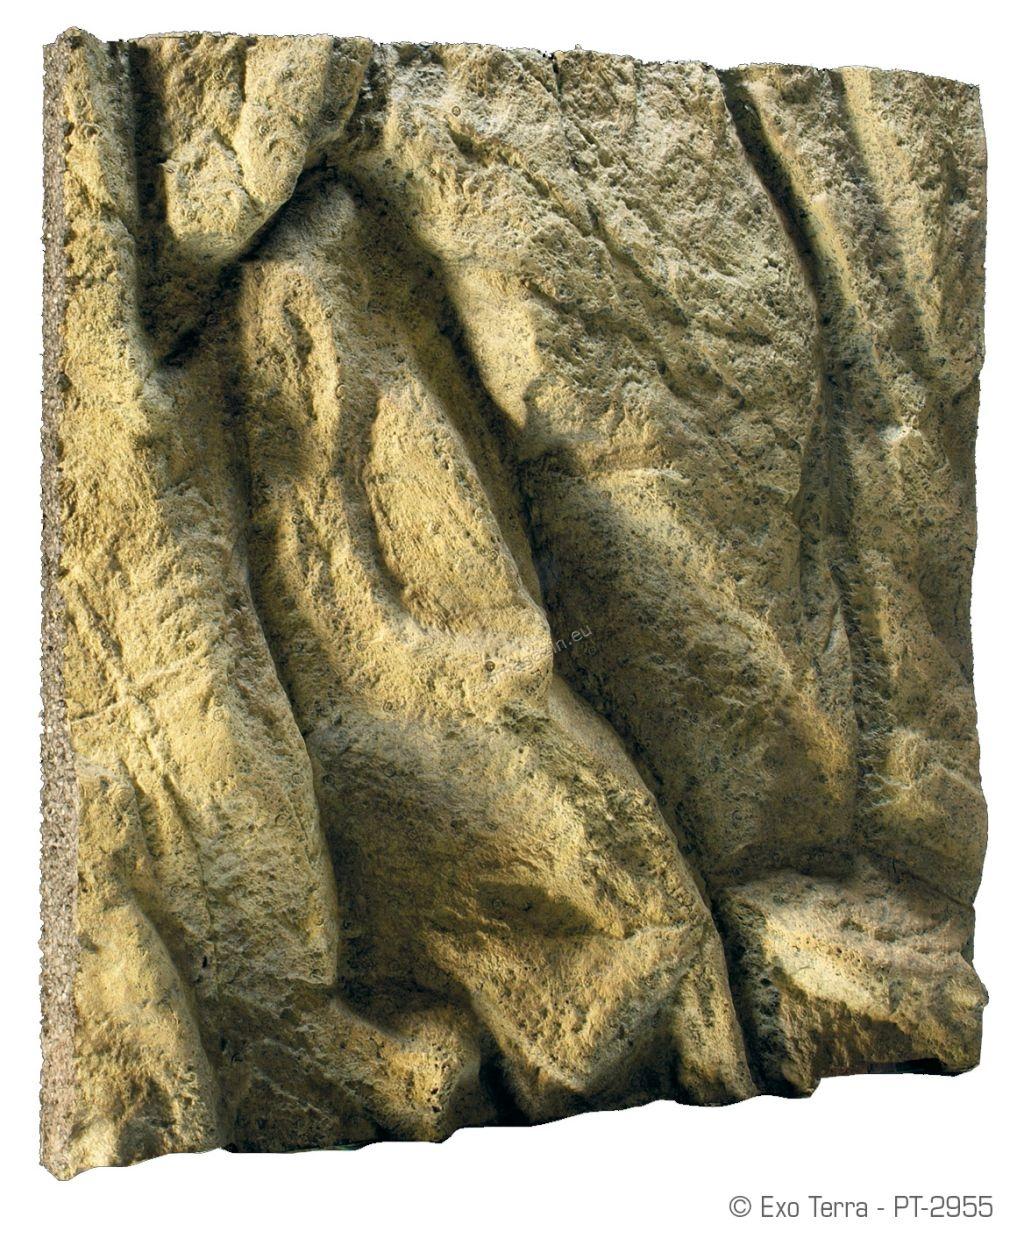 Exo Terra Rock Terrarium Background - πίσω υπόβαθρο για ερπετάριο με βράχο 45x45 cm pt2955